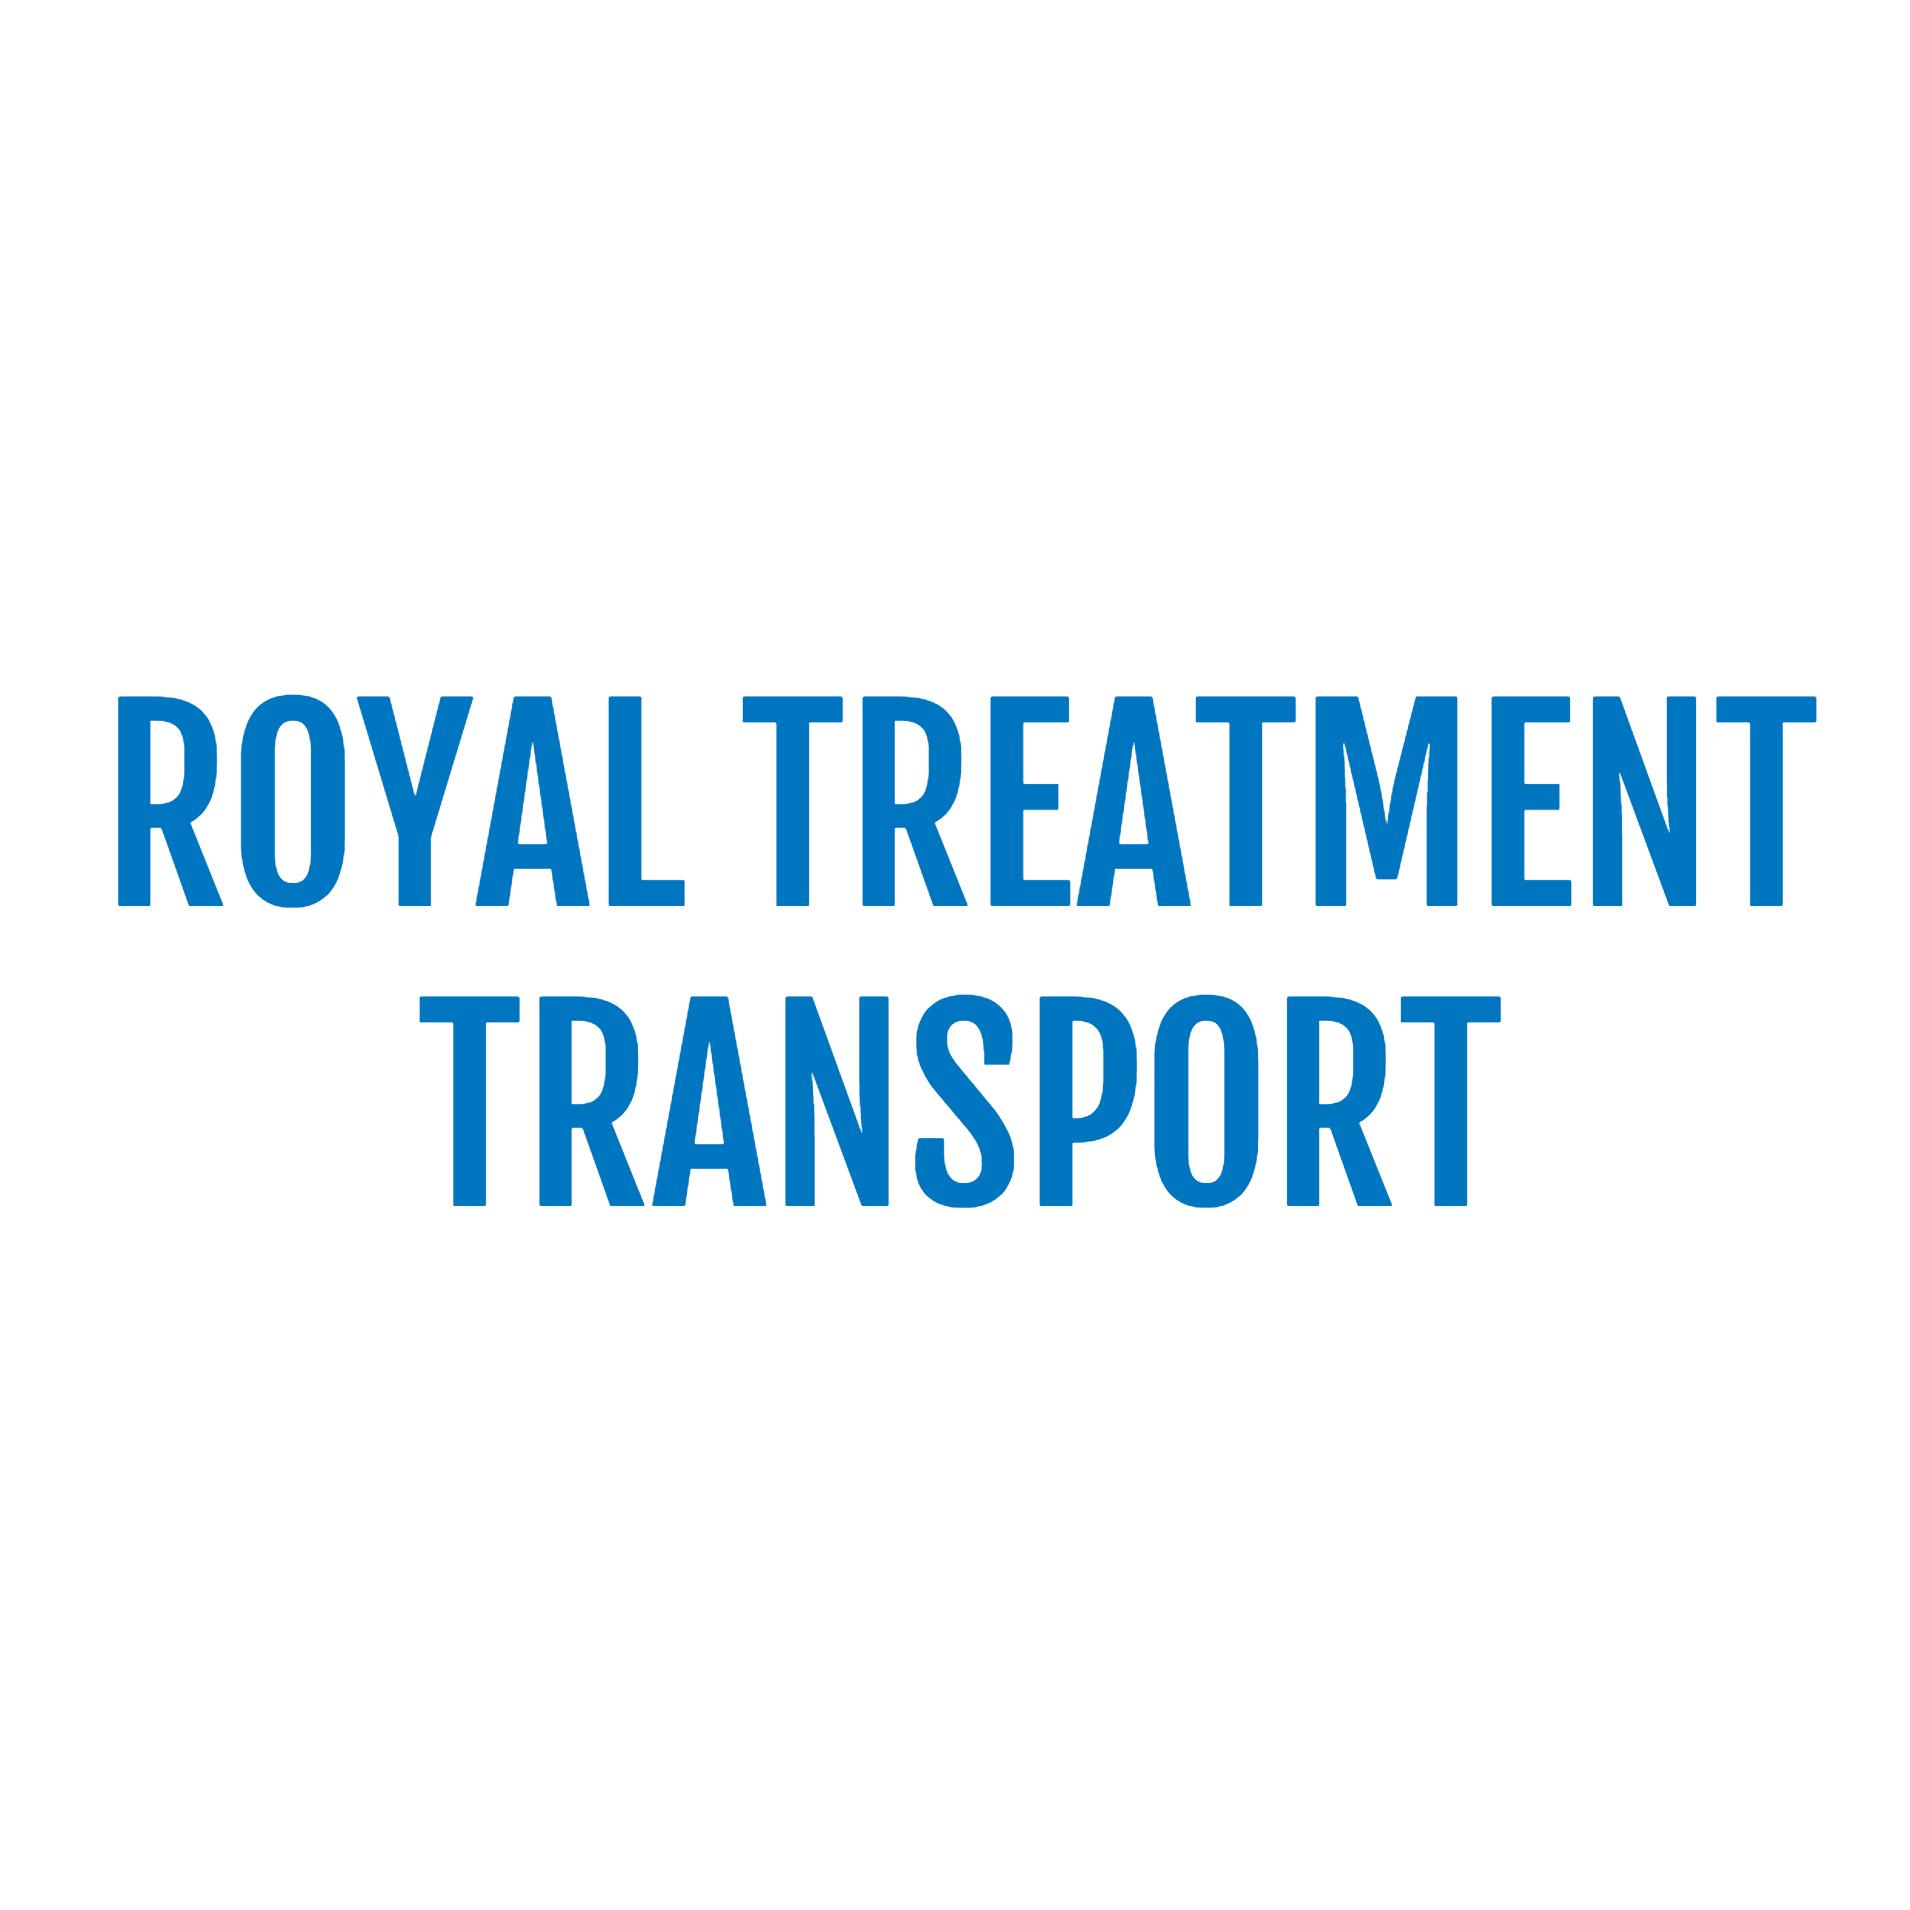 Royal Treatment Transport logo